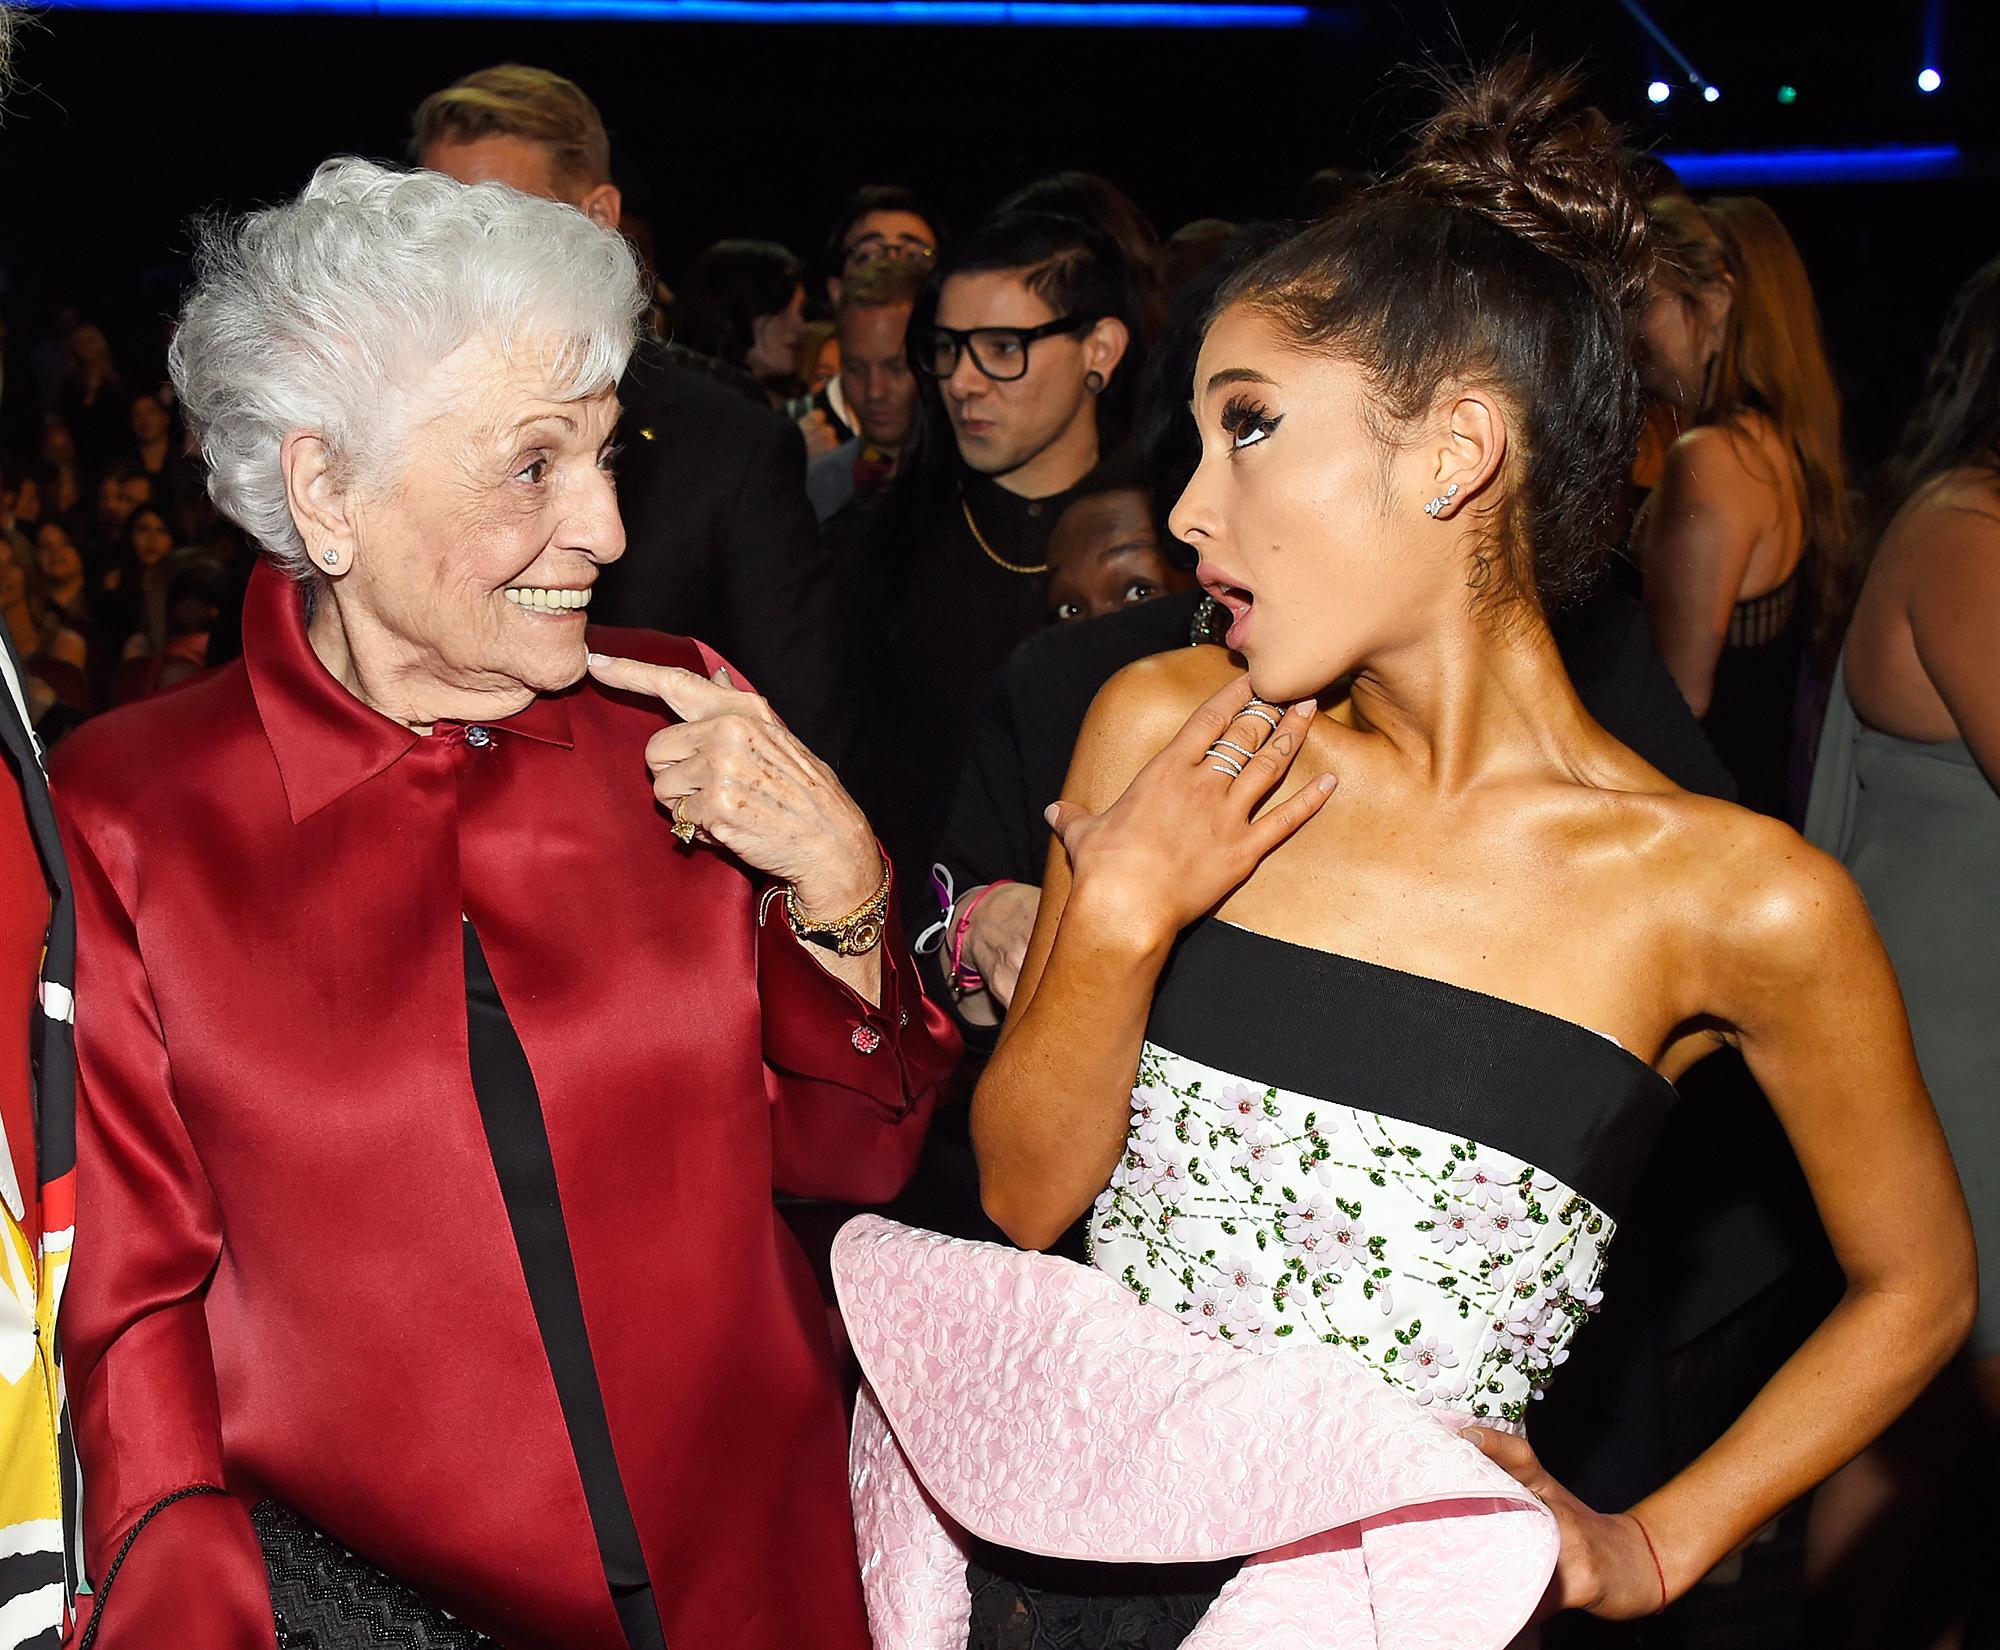 Ariana Grande Nonna Tattoos - Ariana Grande Nonna Tattoos – Marjorie 'Nonna' Grande, and recording artist Ariana Grande attend the 2015 American Music Awards at Microsoft Theater on November 22, 2015 in Los Angeles, California.